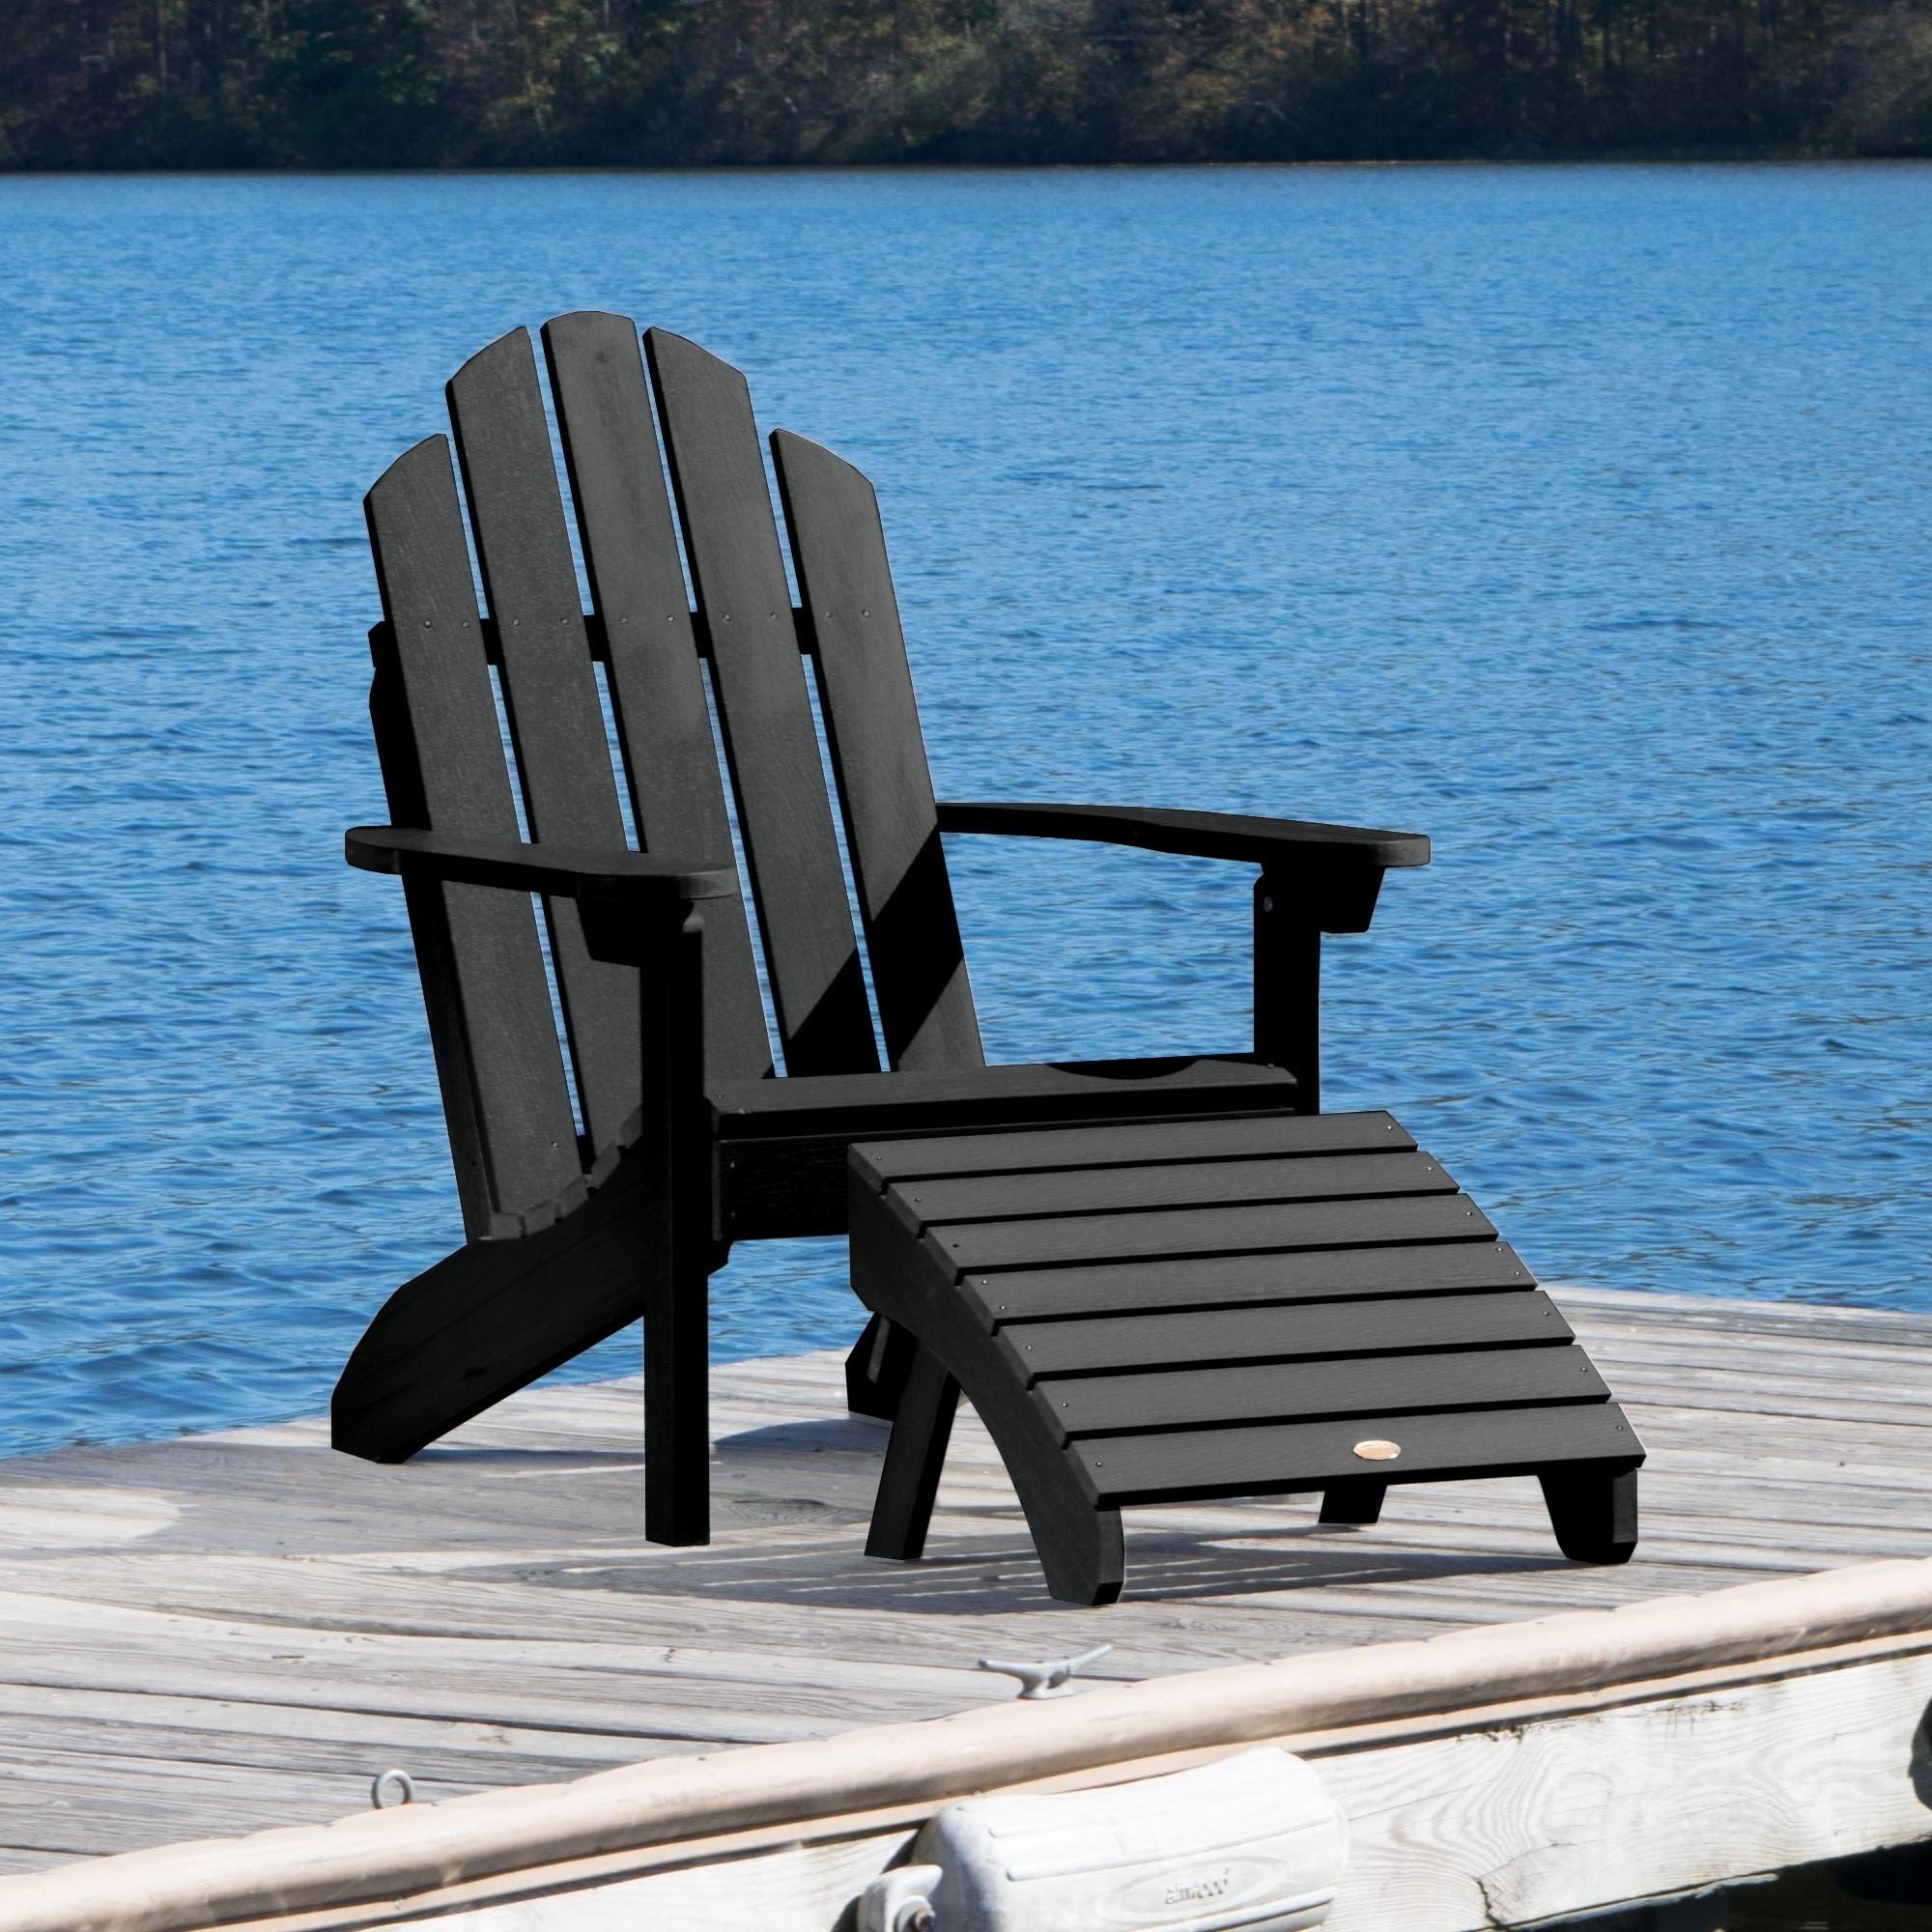 1 Classic Westport Adirondack Chair With 1 Folding Ottoman